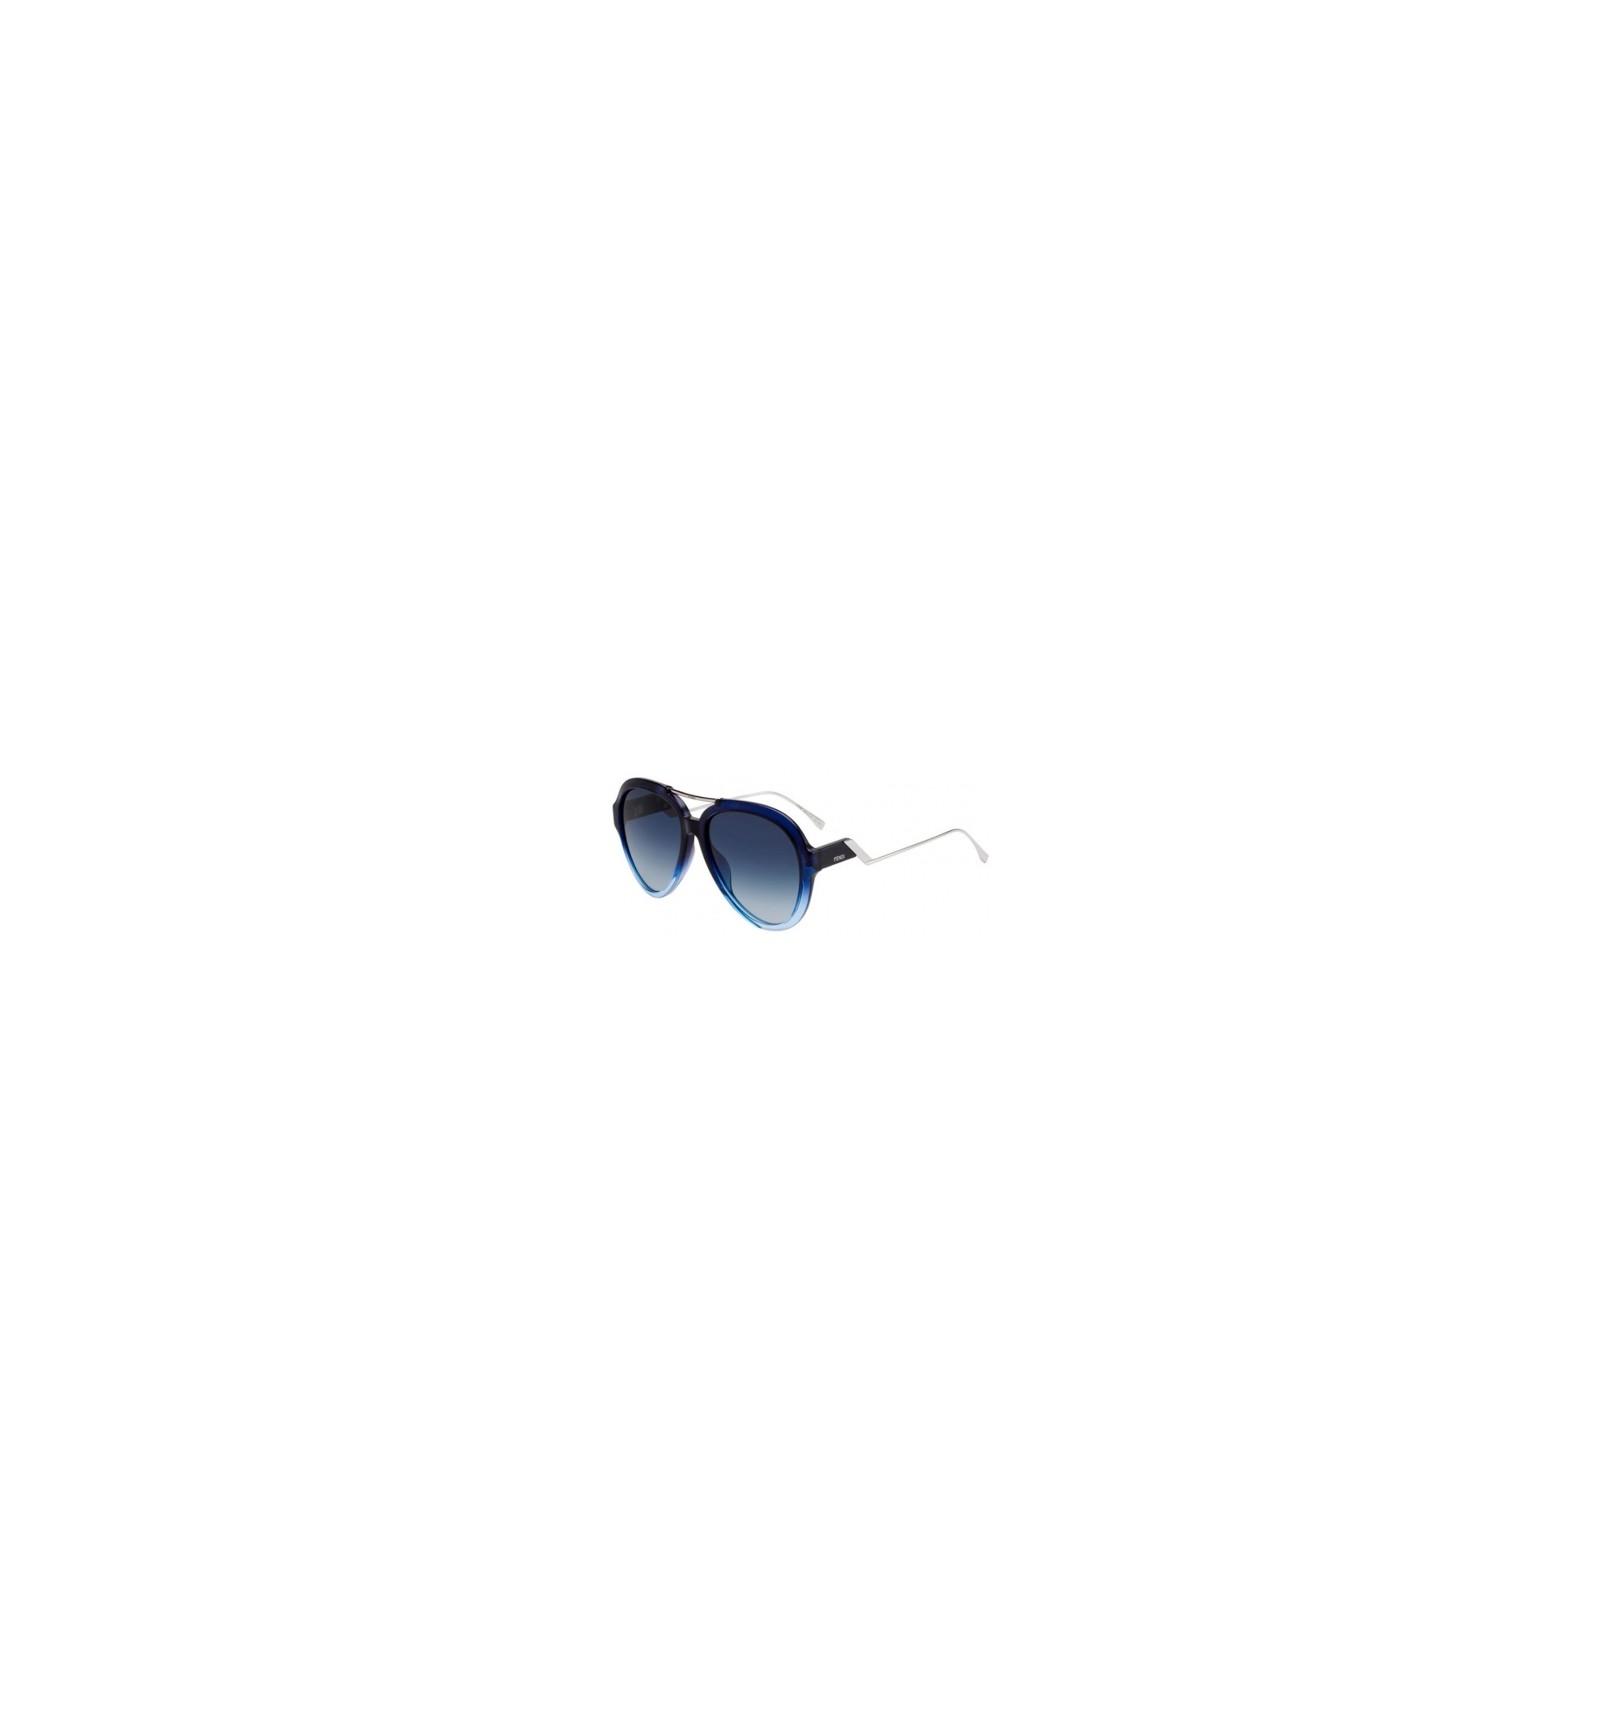 0a13b84899 Gafas de sol Fendi FF M00322G S Blue Azure - Dark Blue Gradient (ZX9-